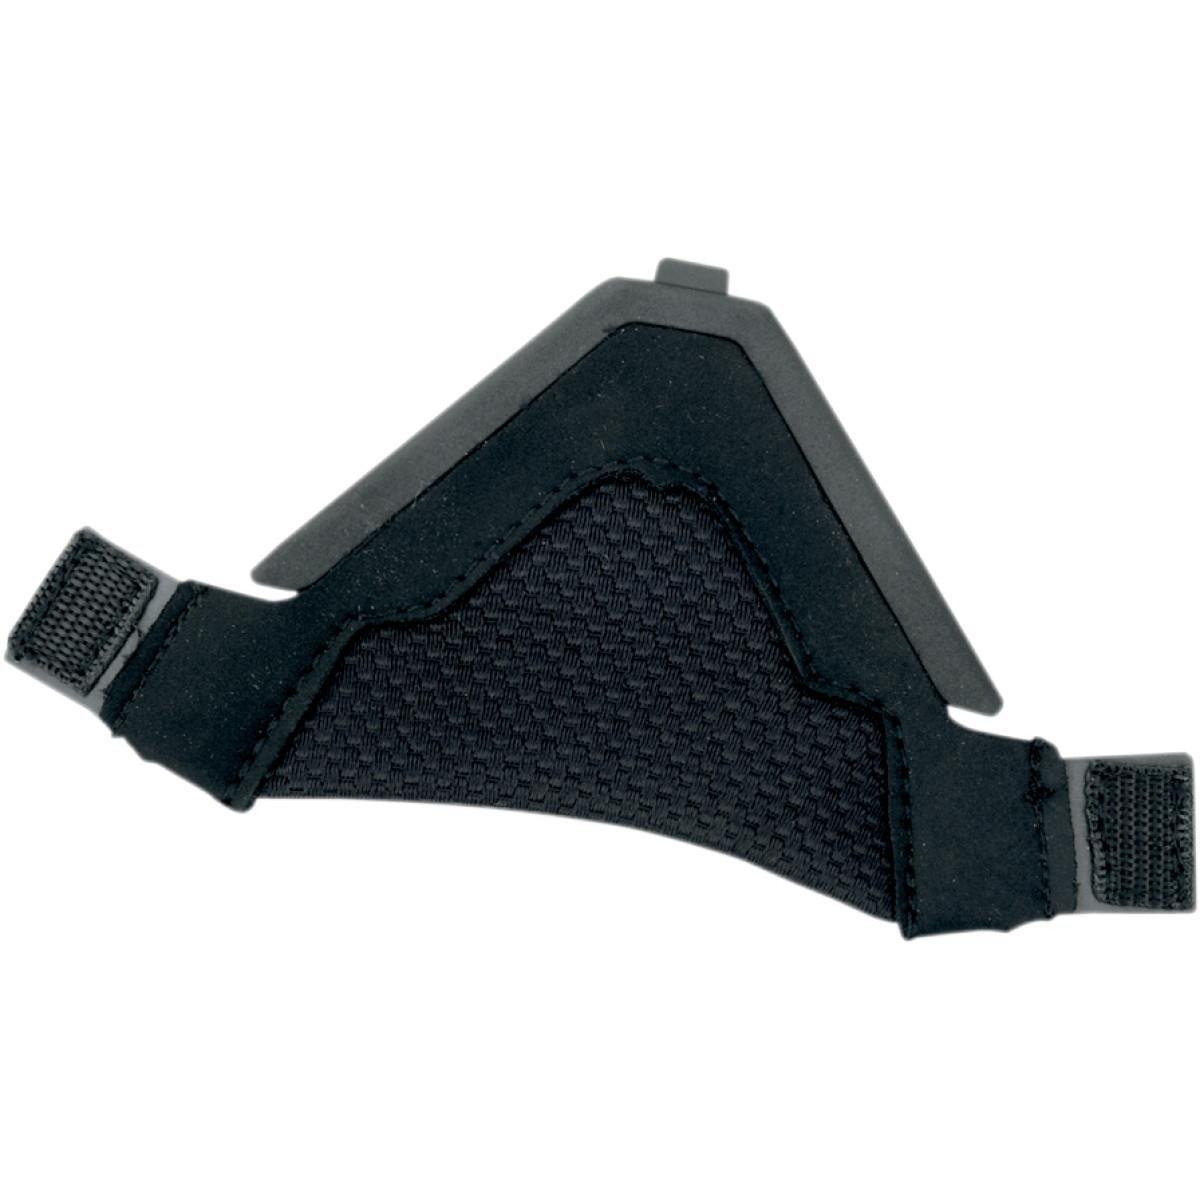 AGV Helmet Wind Protector for AX-8 Dual Sport - Black KIT76026999